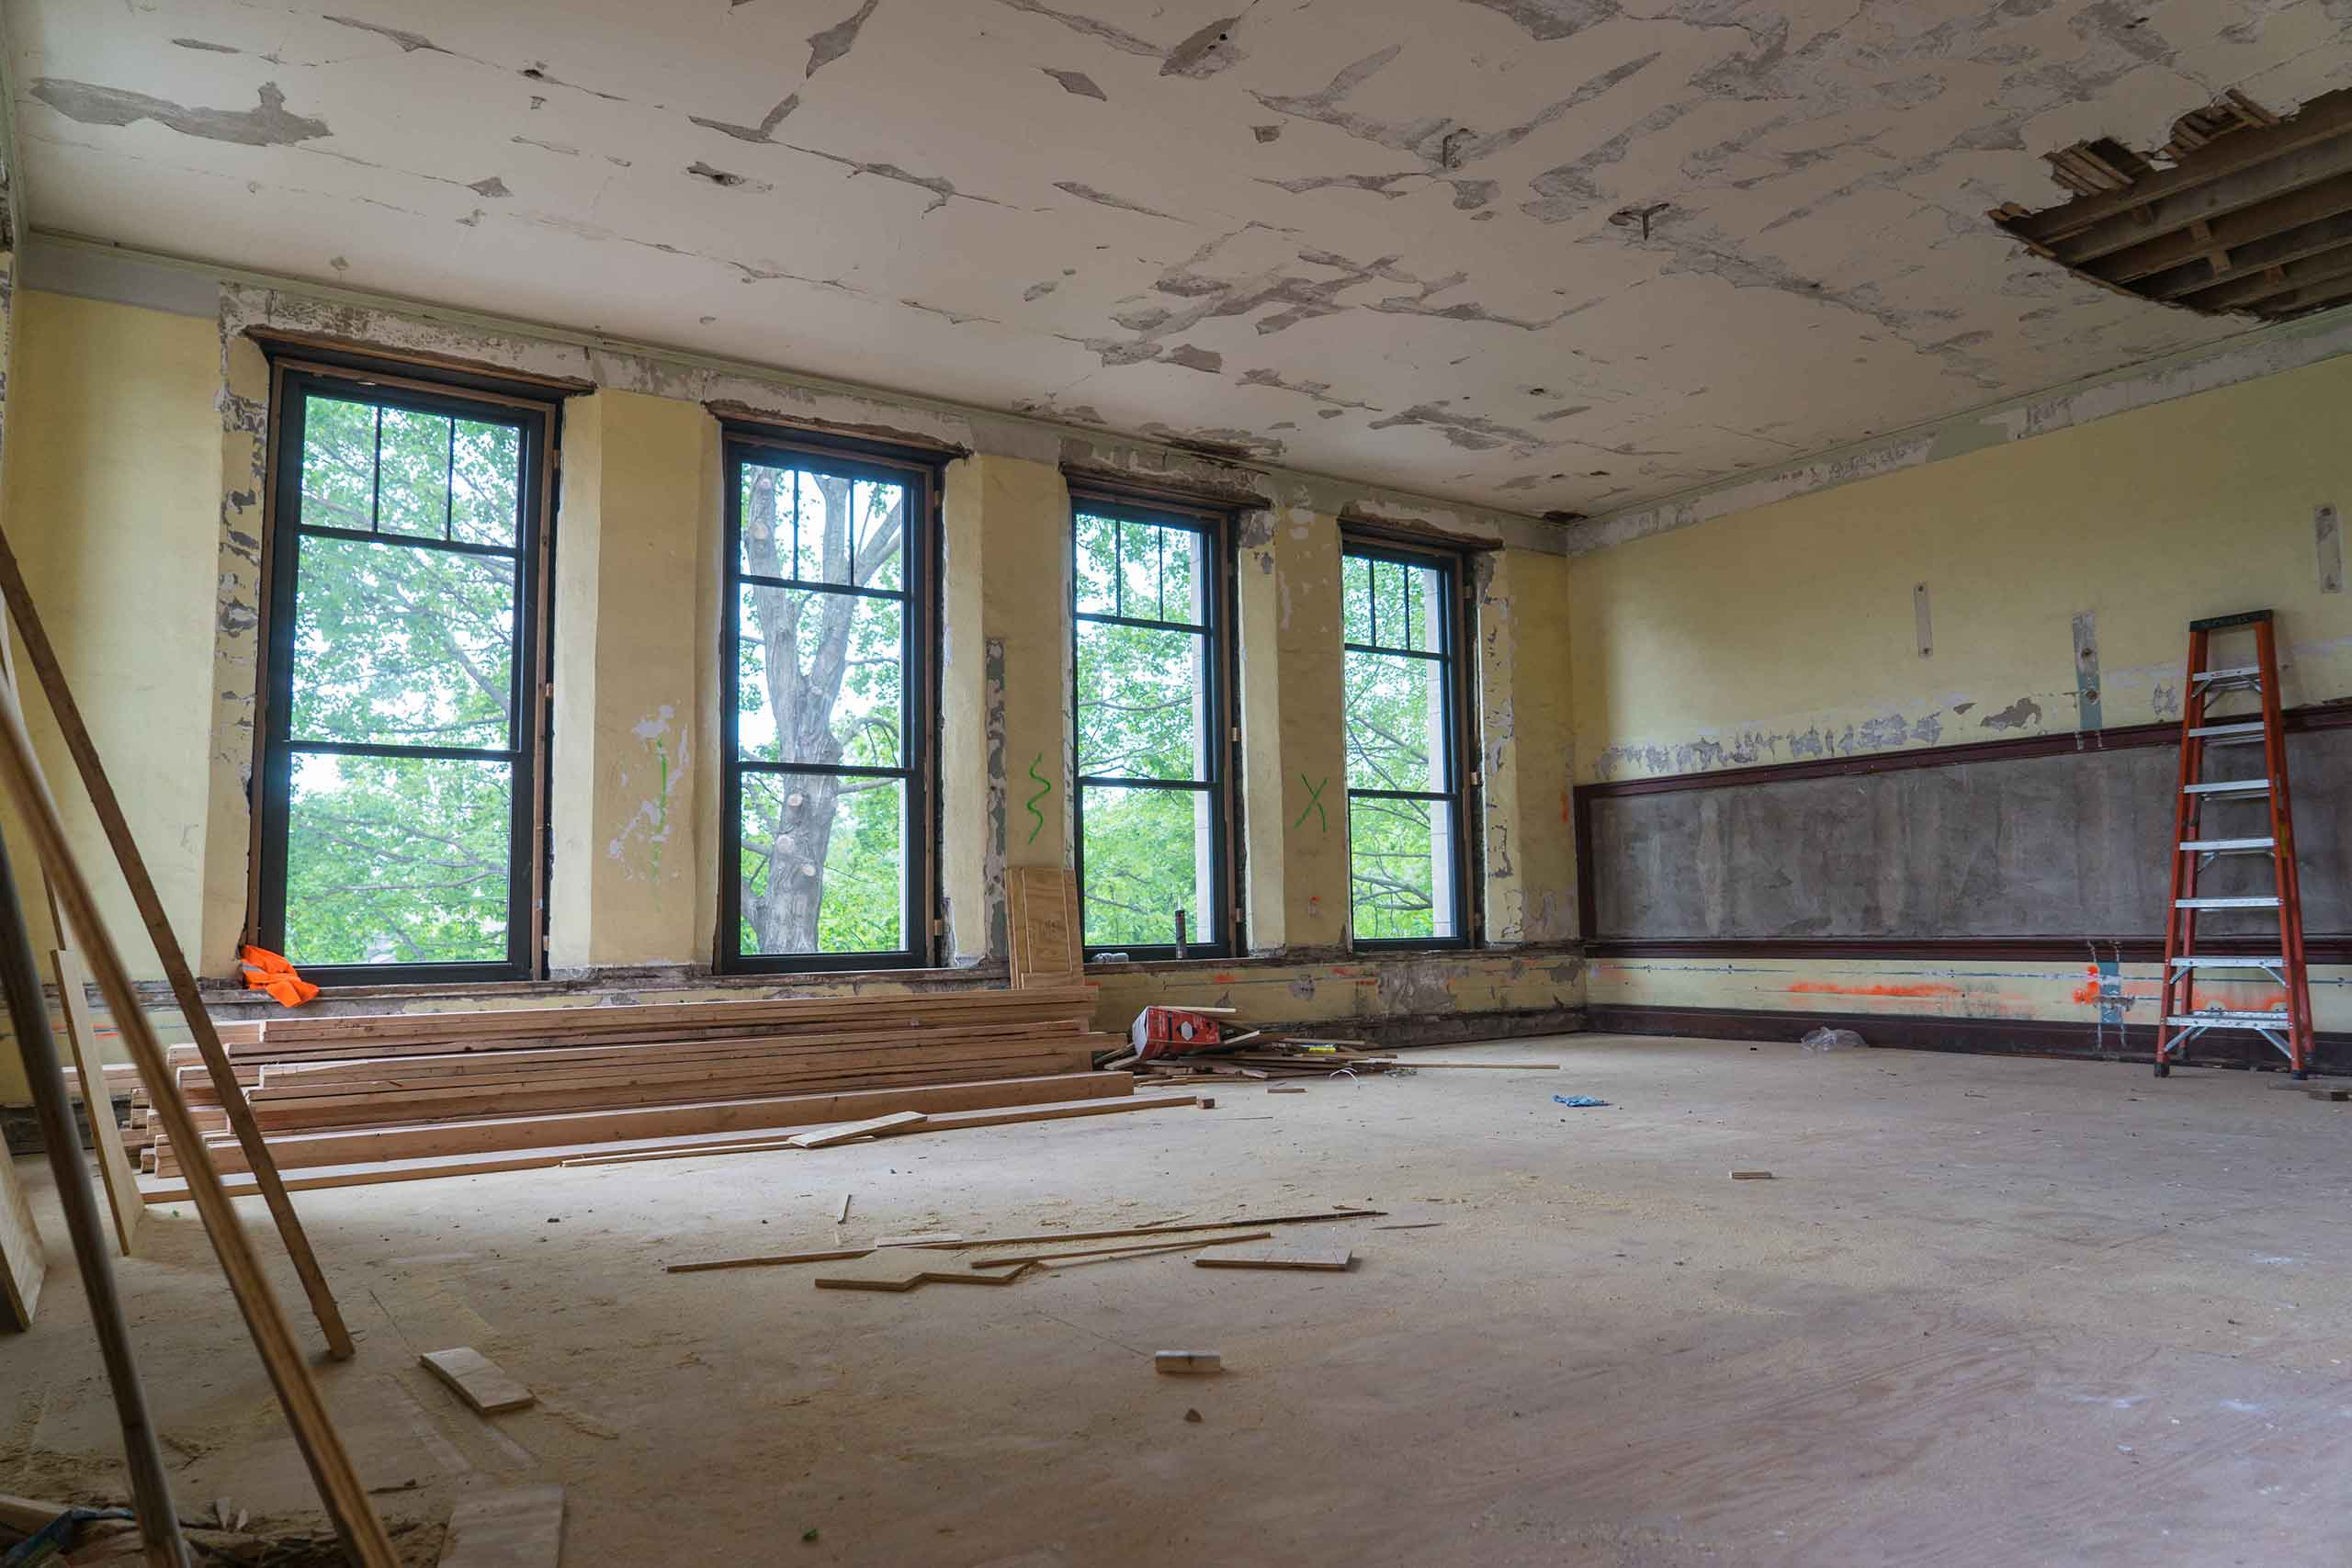 Norman-School-Lofts-Classroom-Blank-3